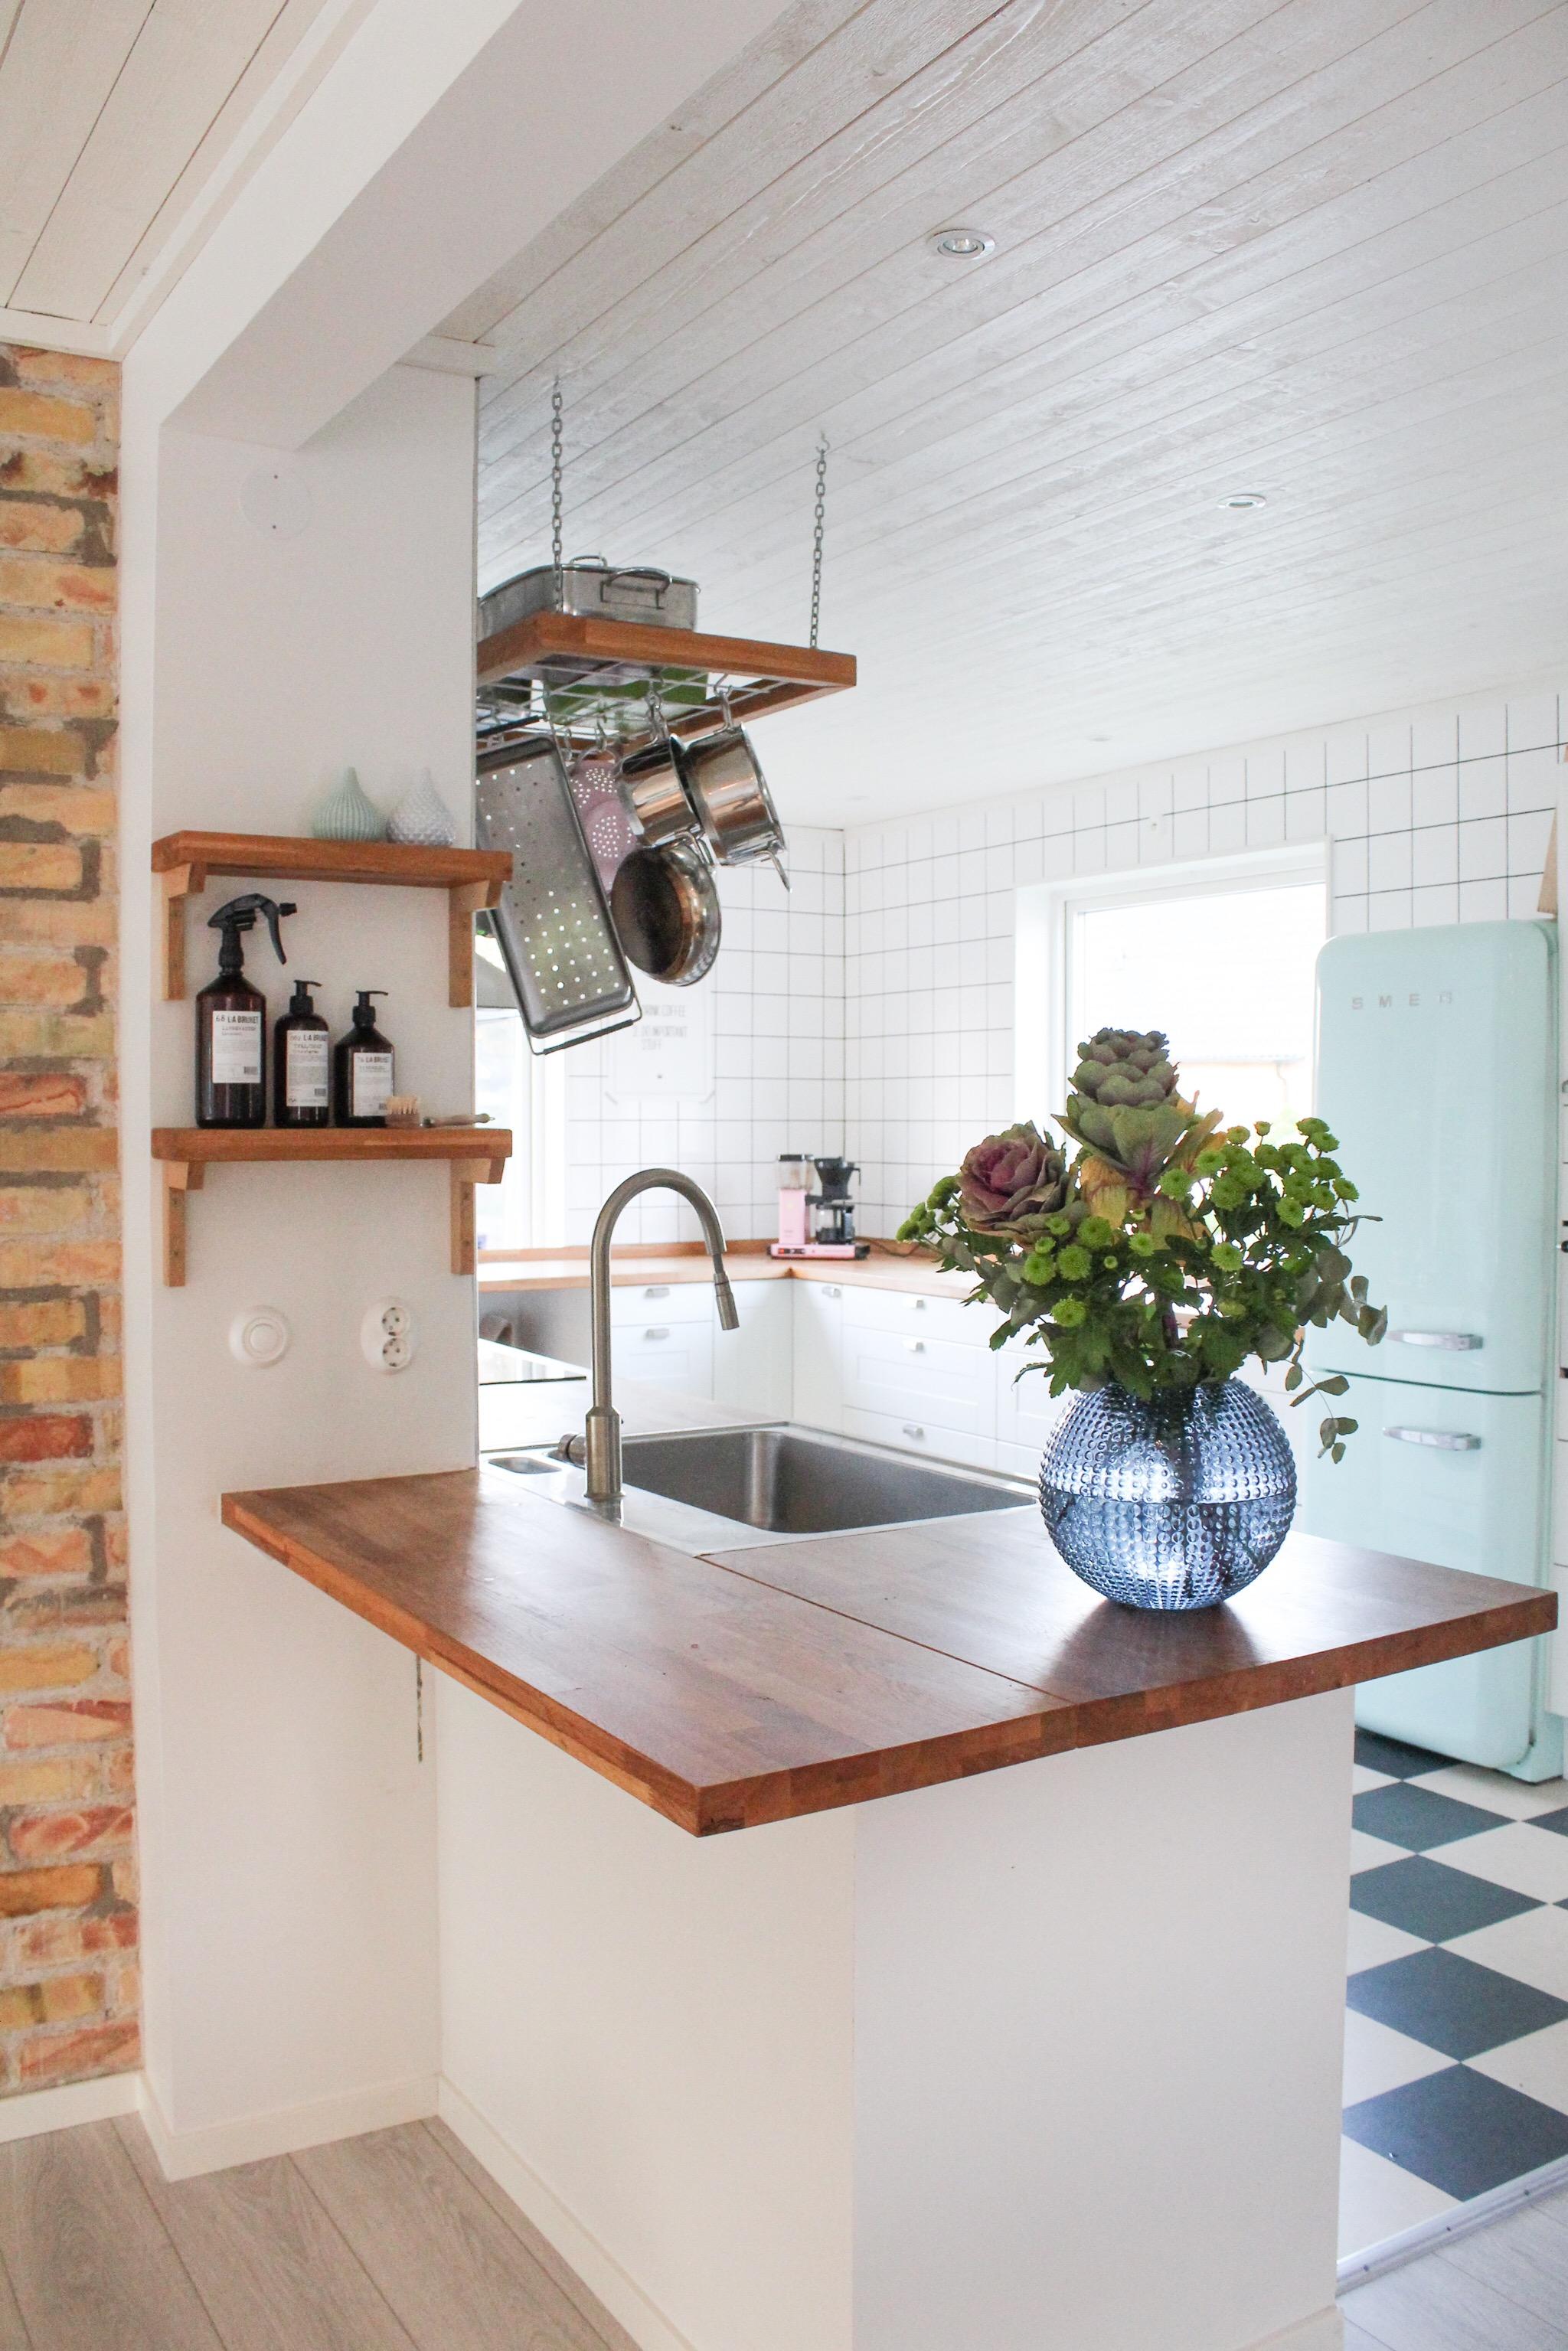 Kaffe på stående fot i köket